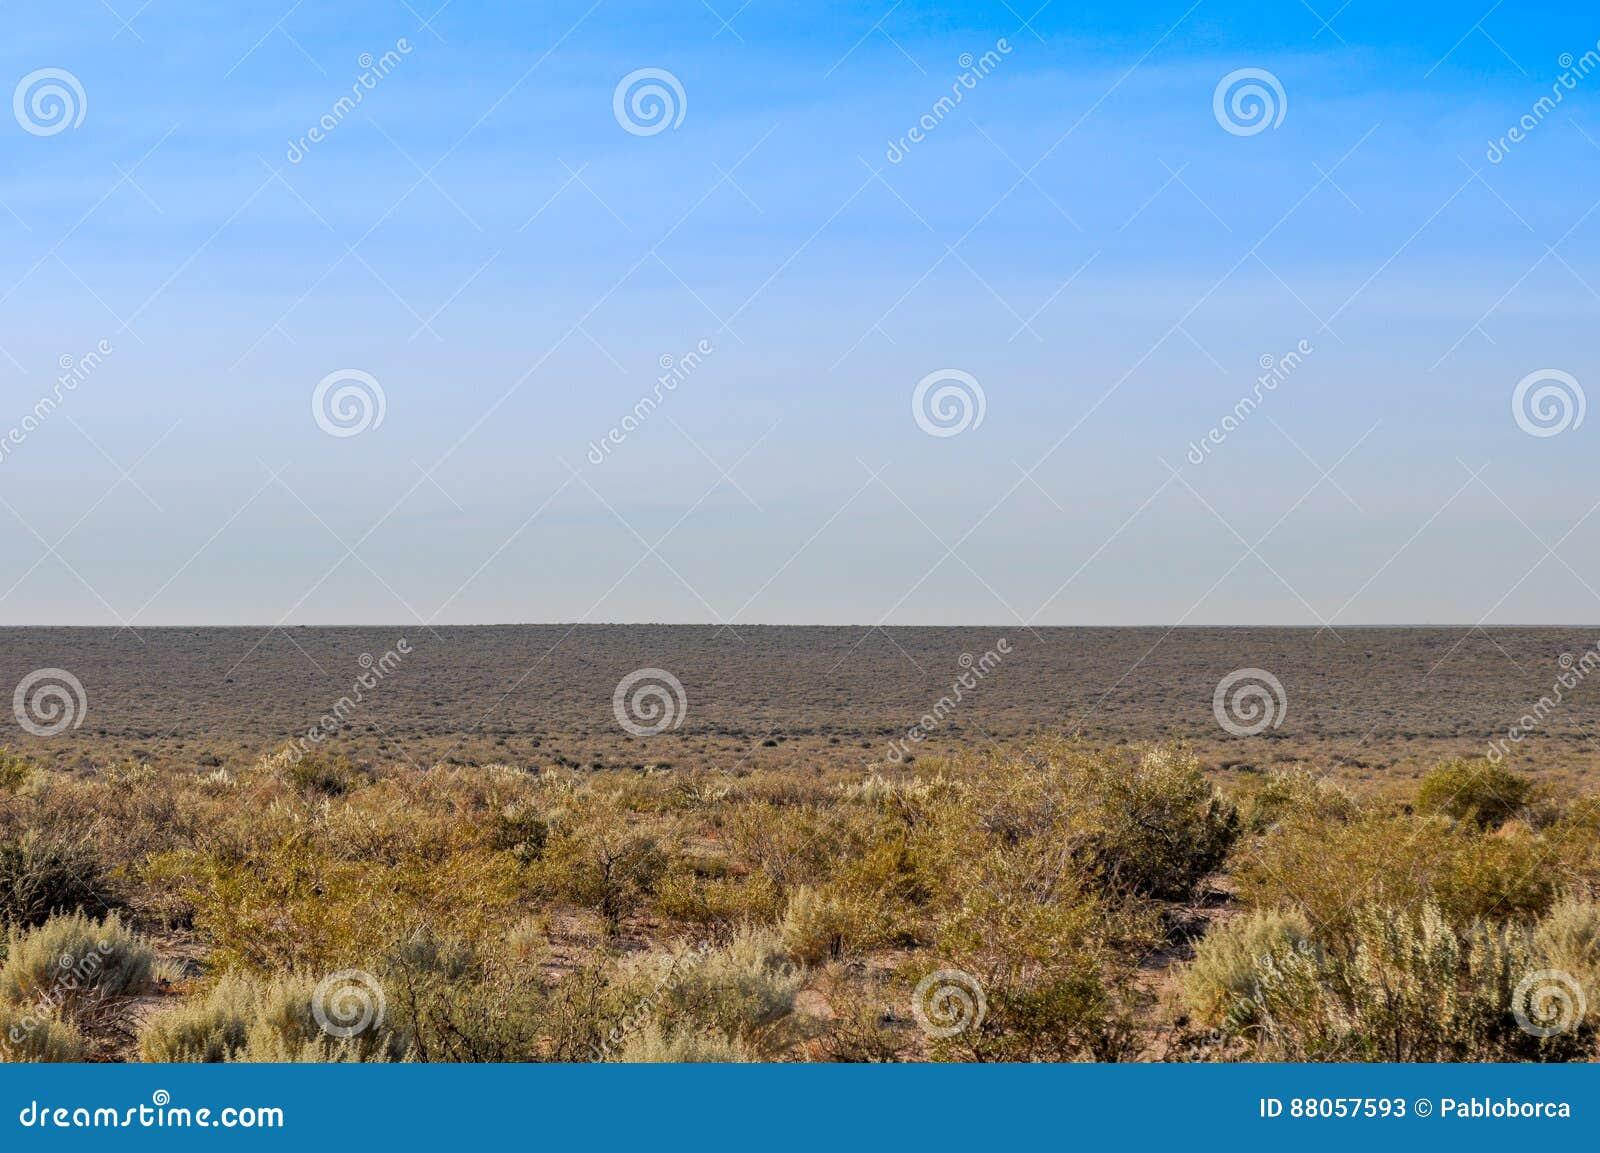 Arid desert of La Pampa, Argentina